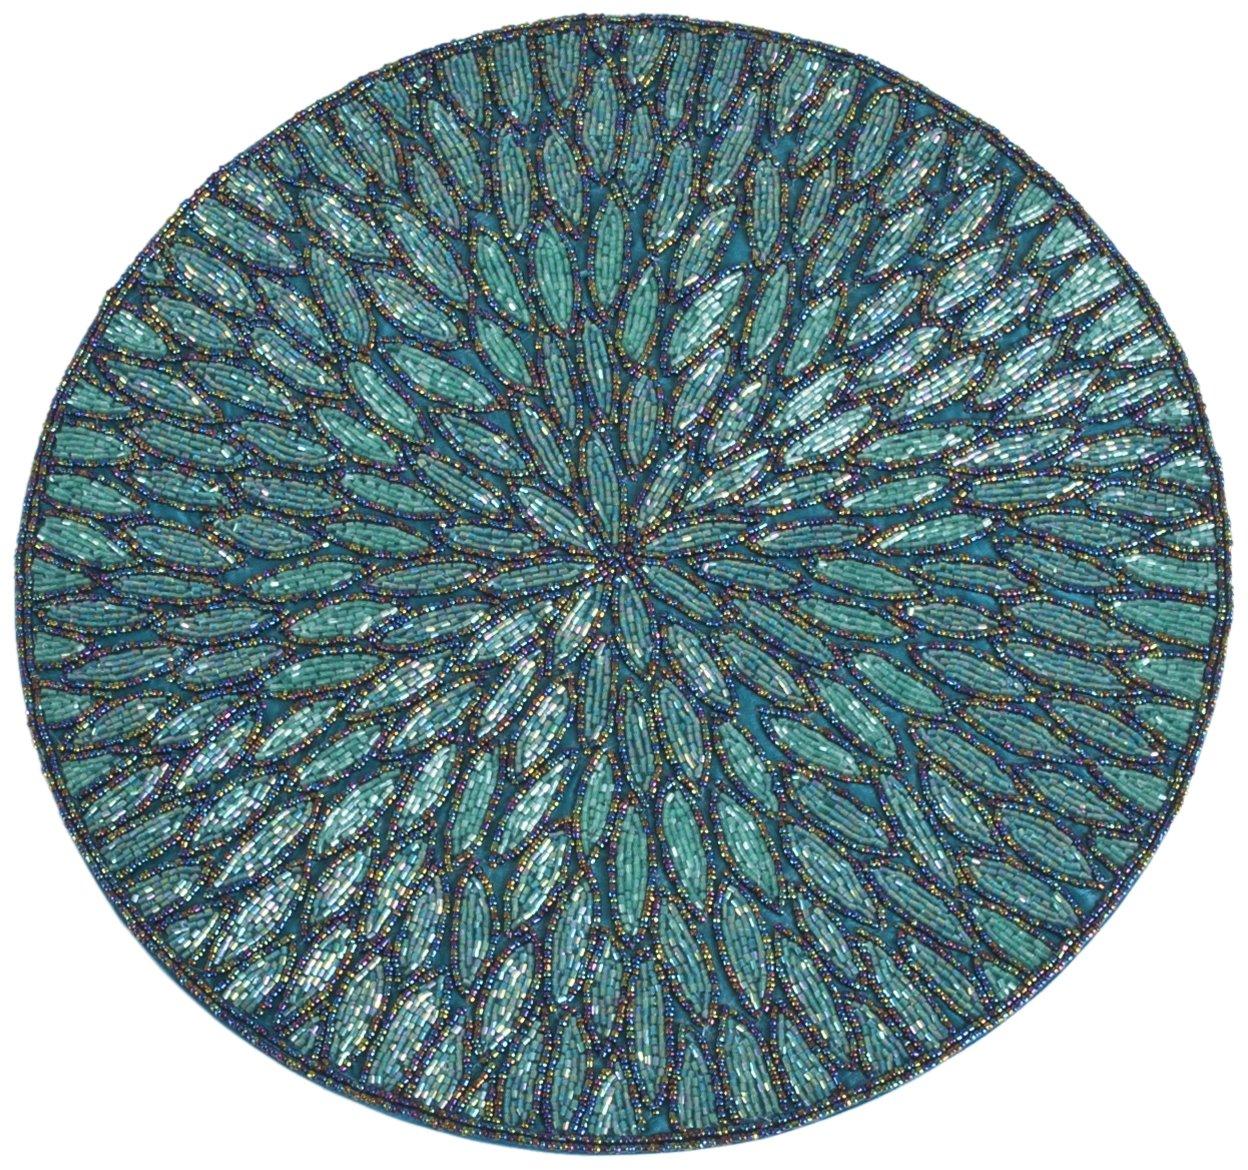 SARO LIFESTYLE Beaded Round Design Placemat 3517.PW15R